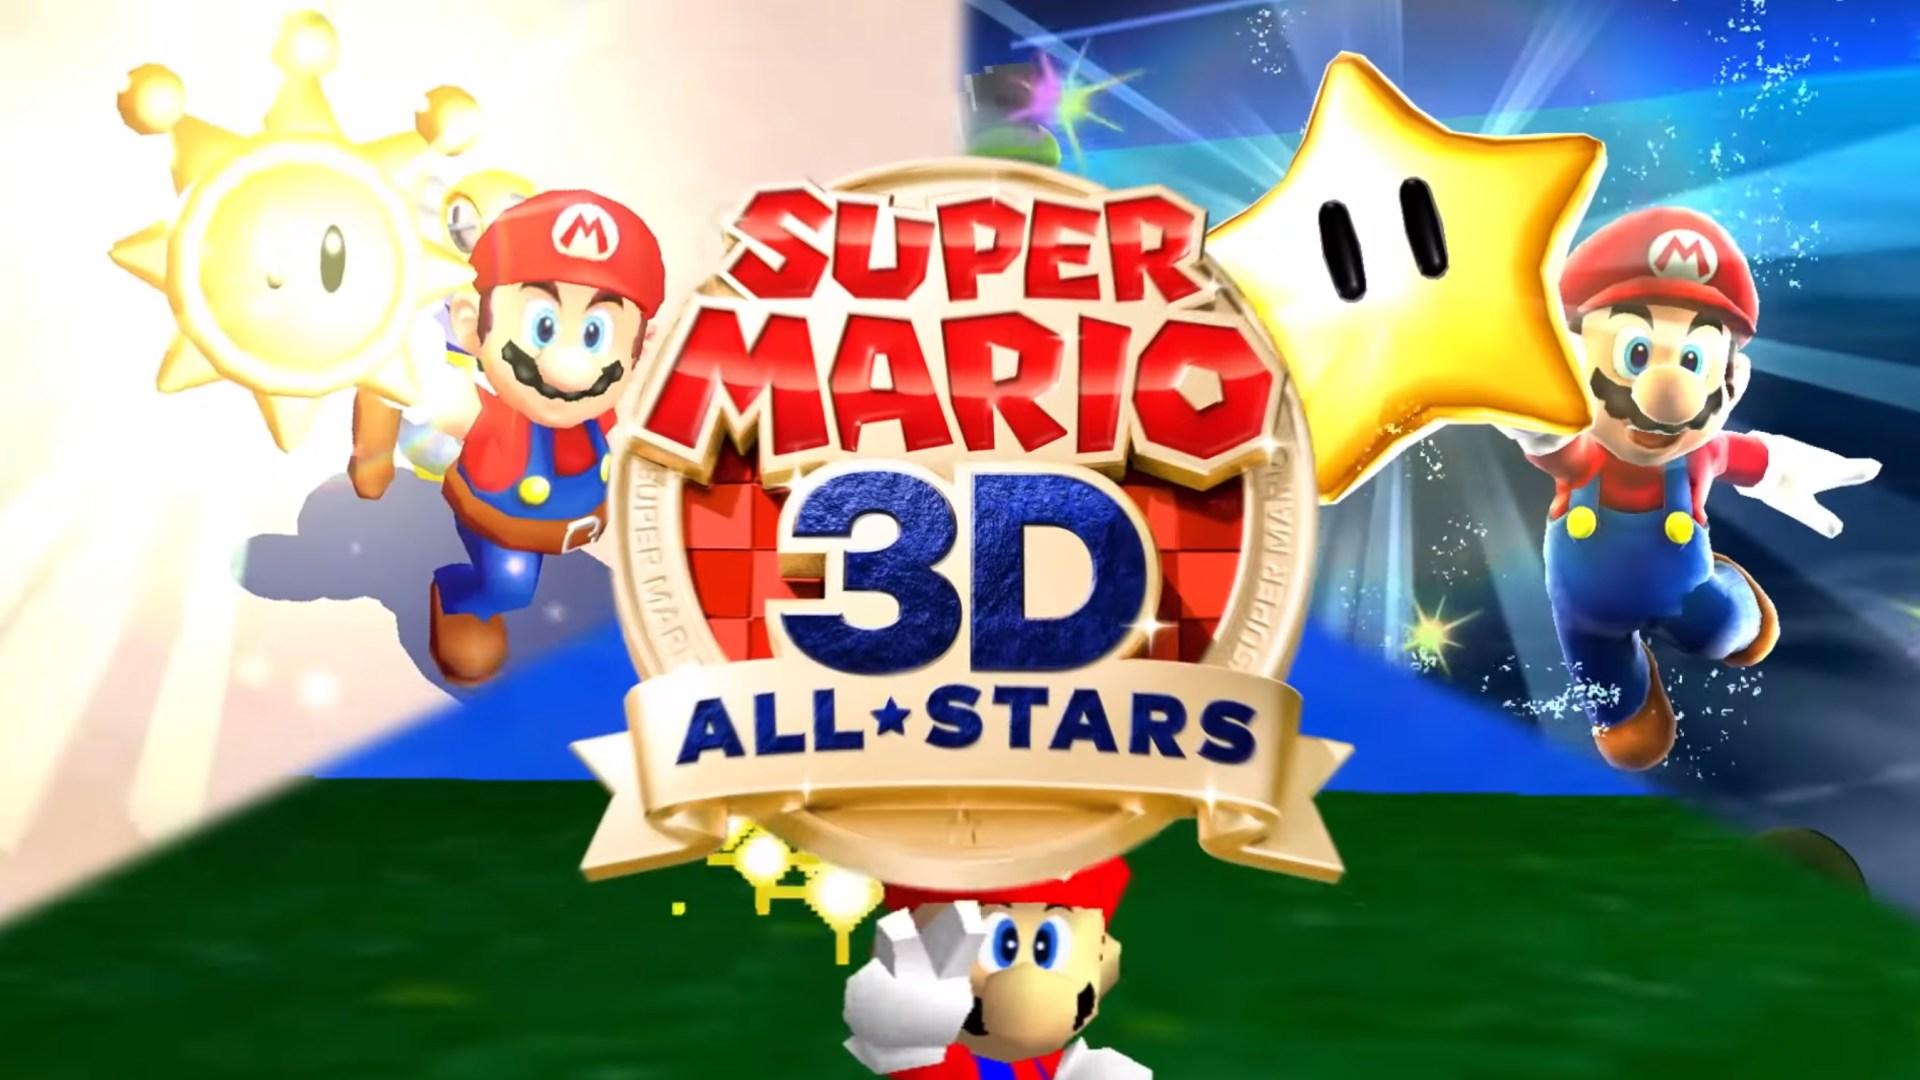 Nintendo, Nintendo Switch, Super Mario, Remake, Mario 3D All-Stars, Mario 64, Mario Sunshine, Mario Galaxy